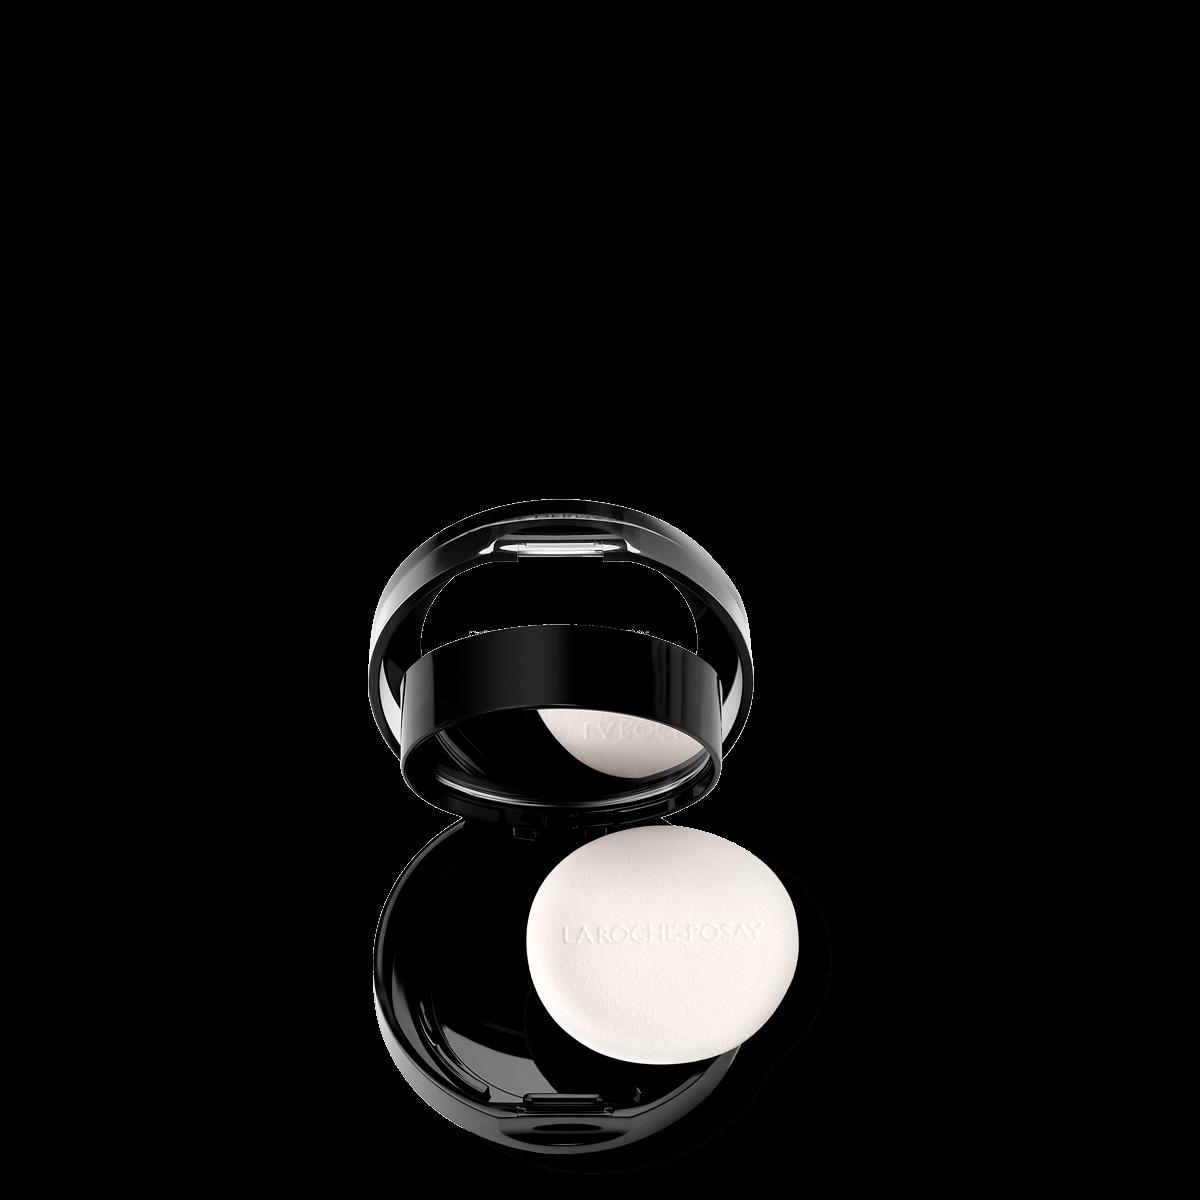 La Roche Posay Sensitiv Toleriane Makeup BLUSH GyldenPink 30102415 O